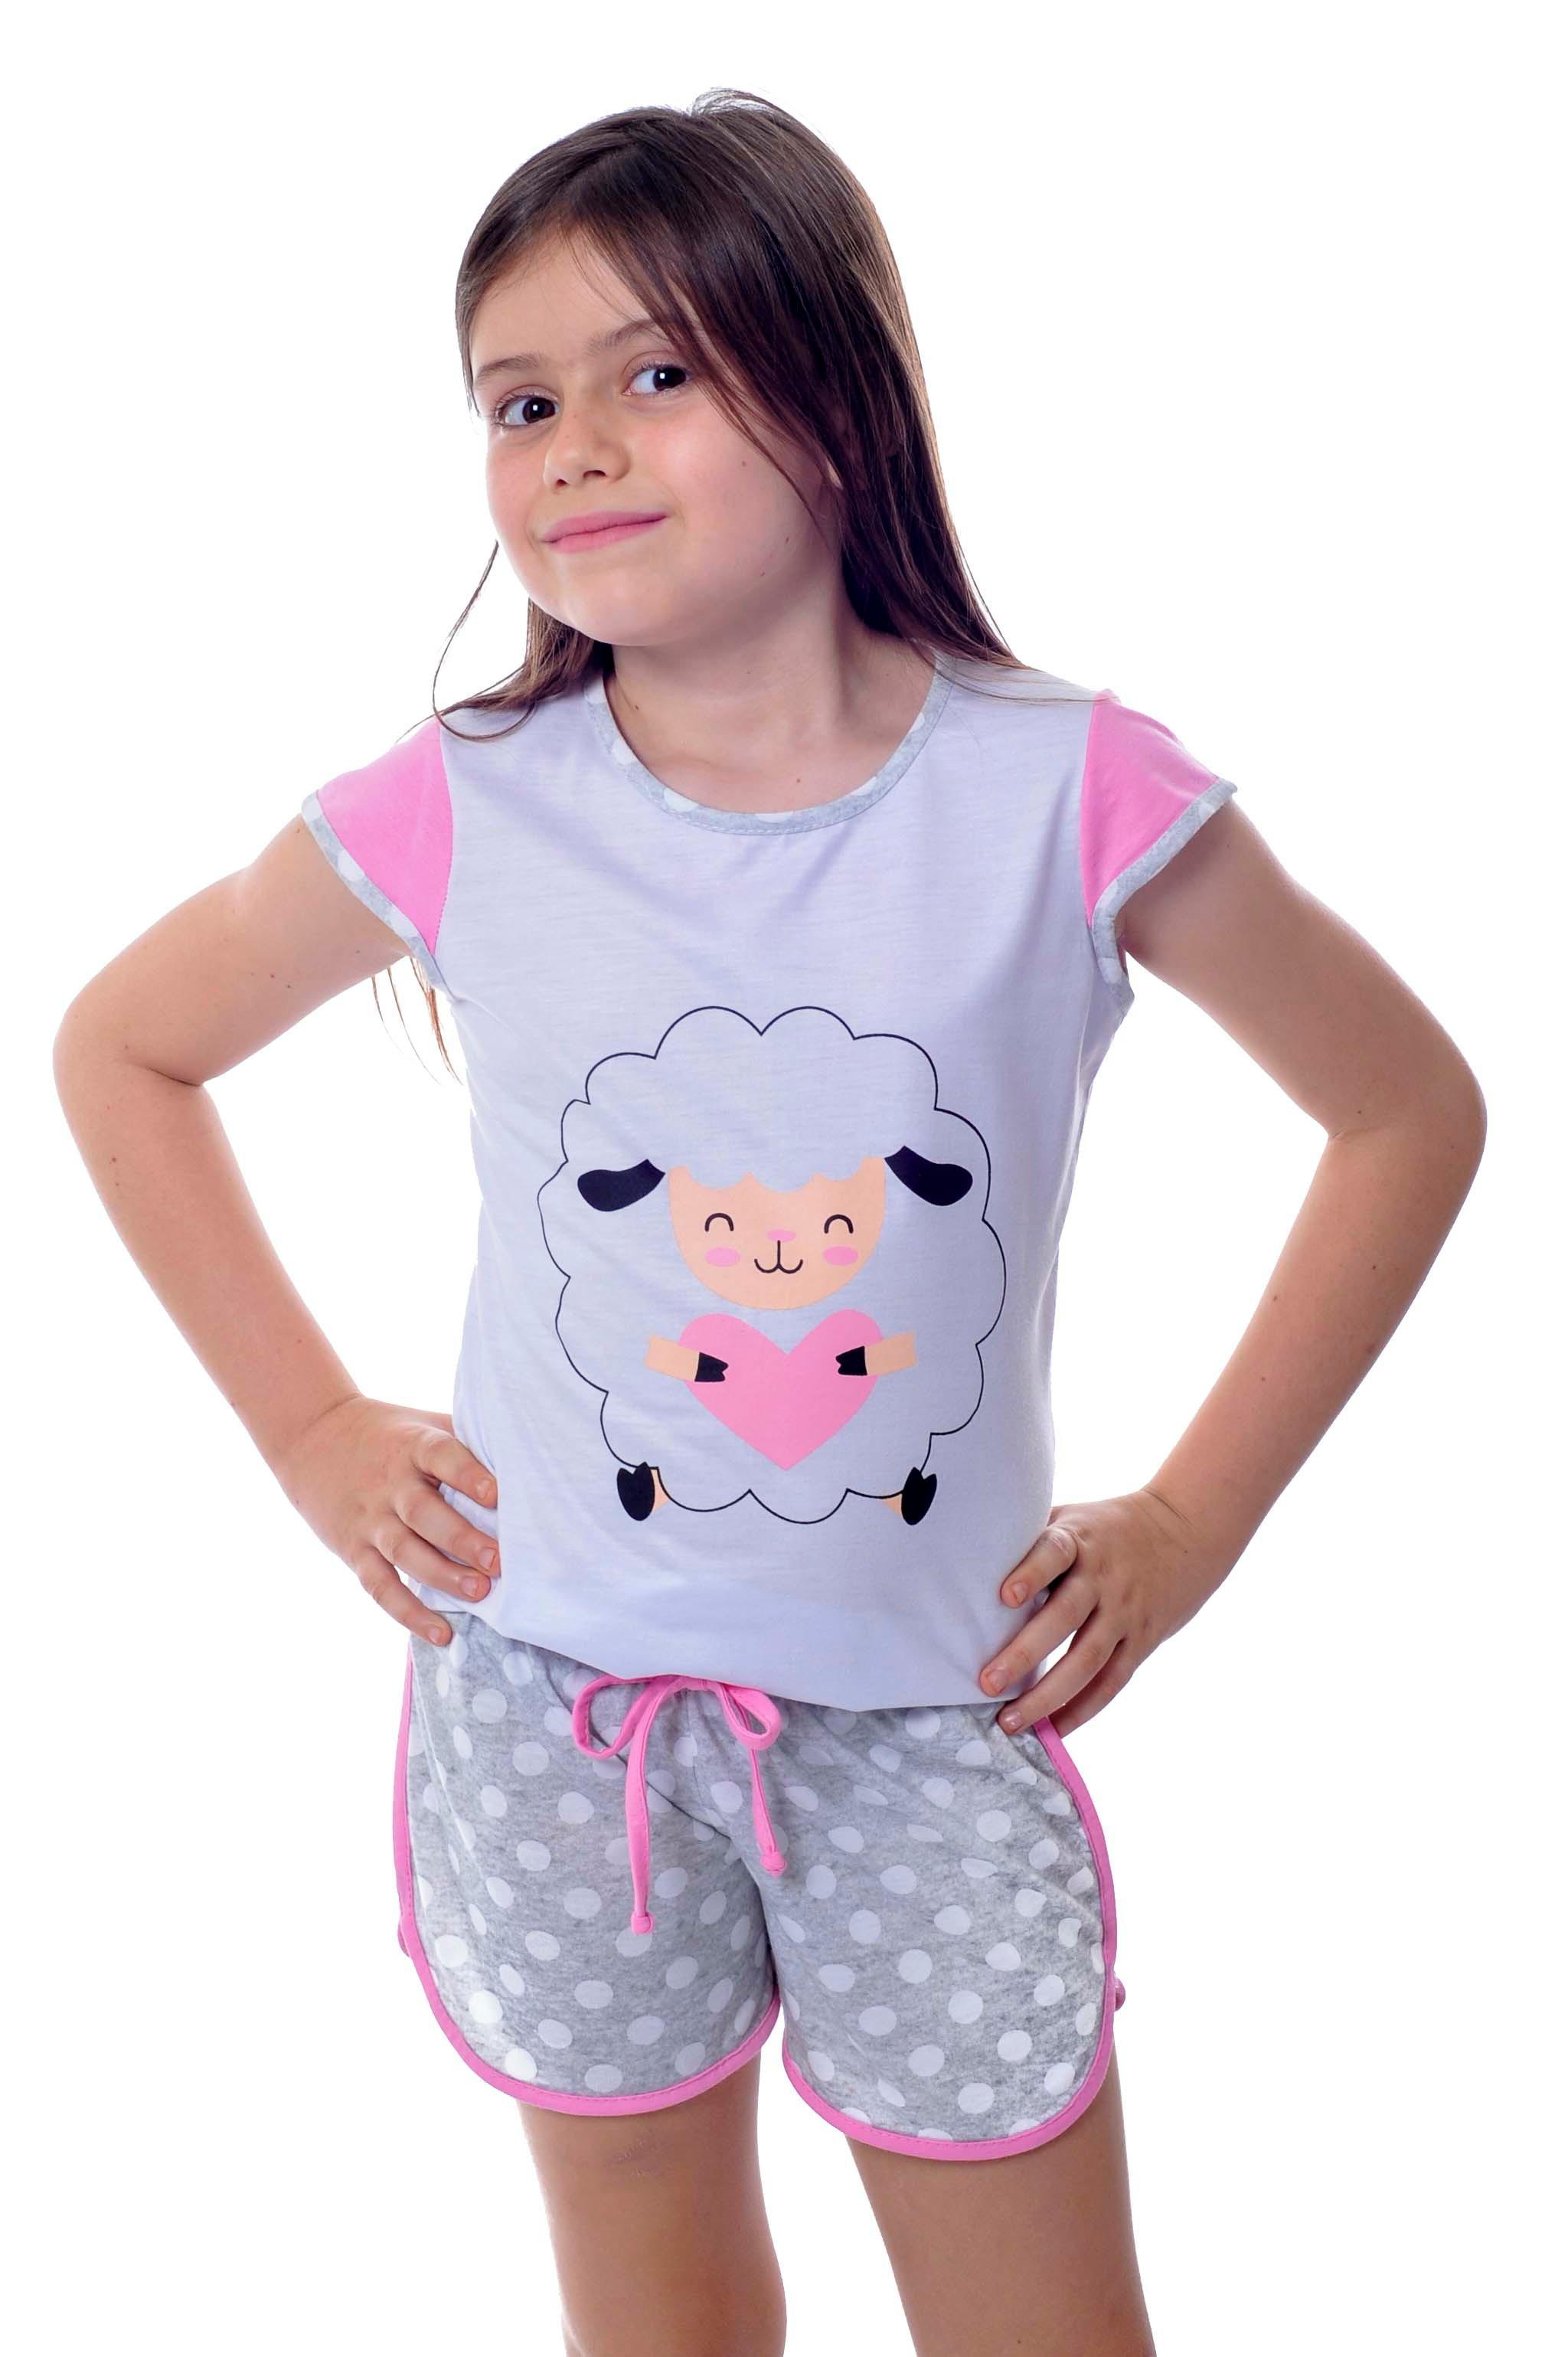 fe97b08f93a Kit Infantil Masculino Feminino Pijamas Conjunto